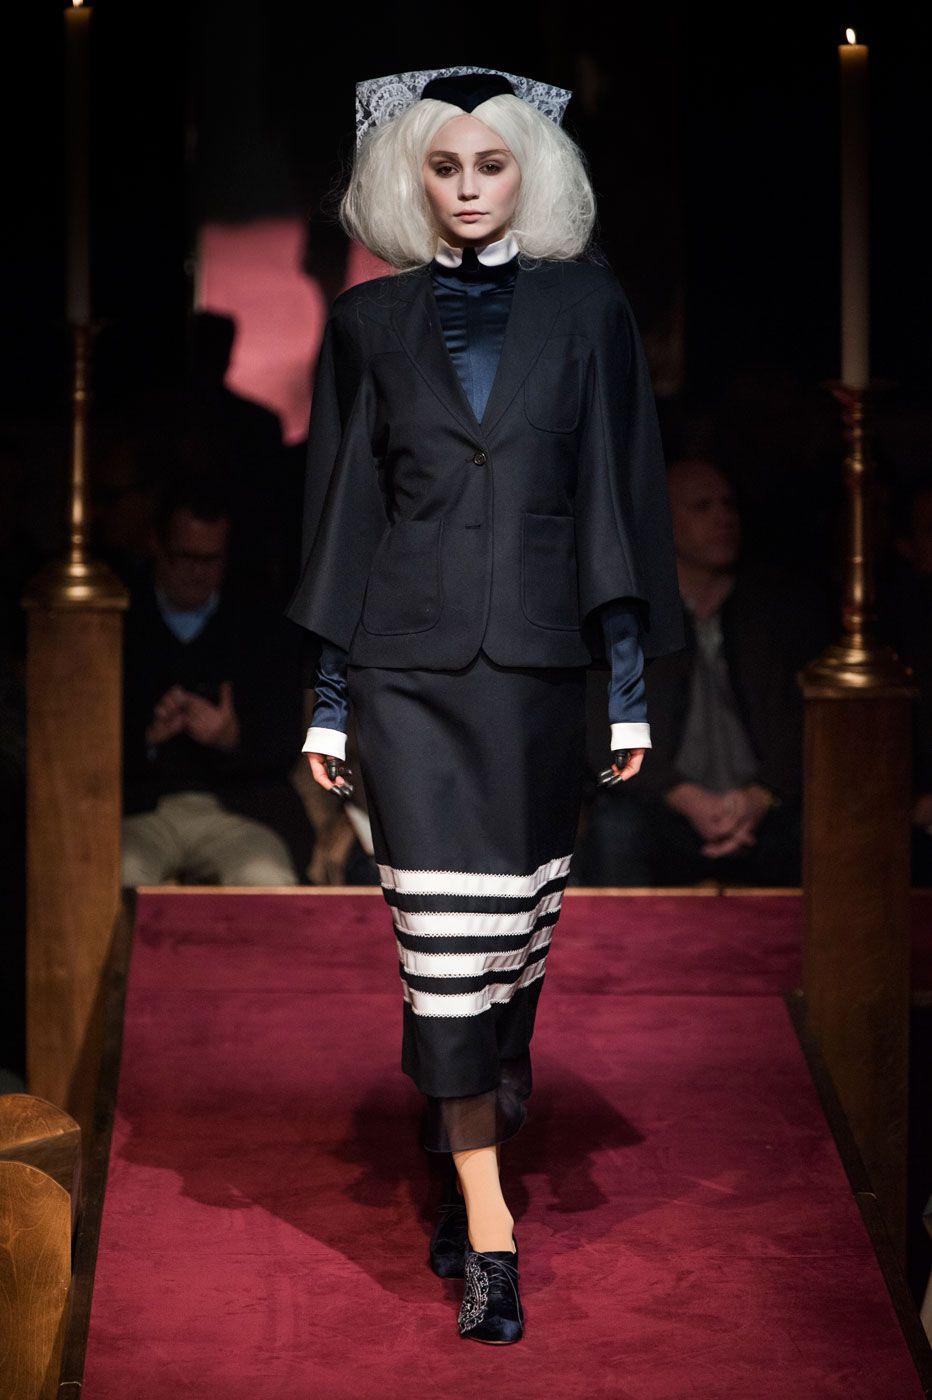 Thom Browne Built a Church, and the Fashion Crowd Came ToWorship Thom Browne Built a Church, and the Fashion Crowd Came ToWorship new images